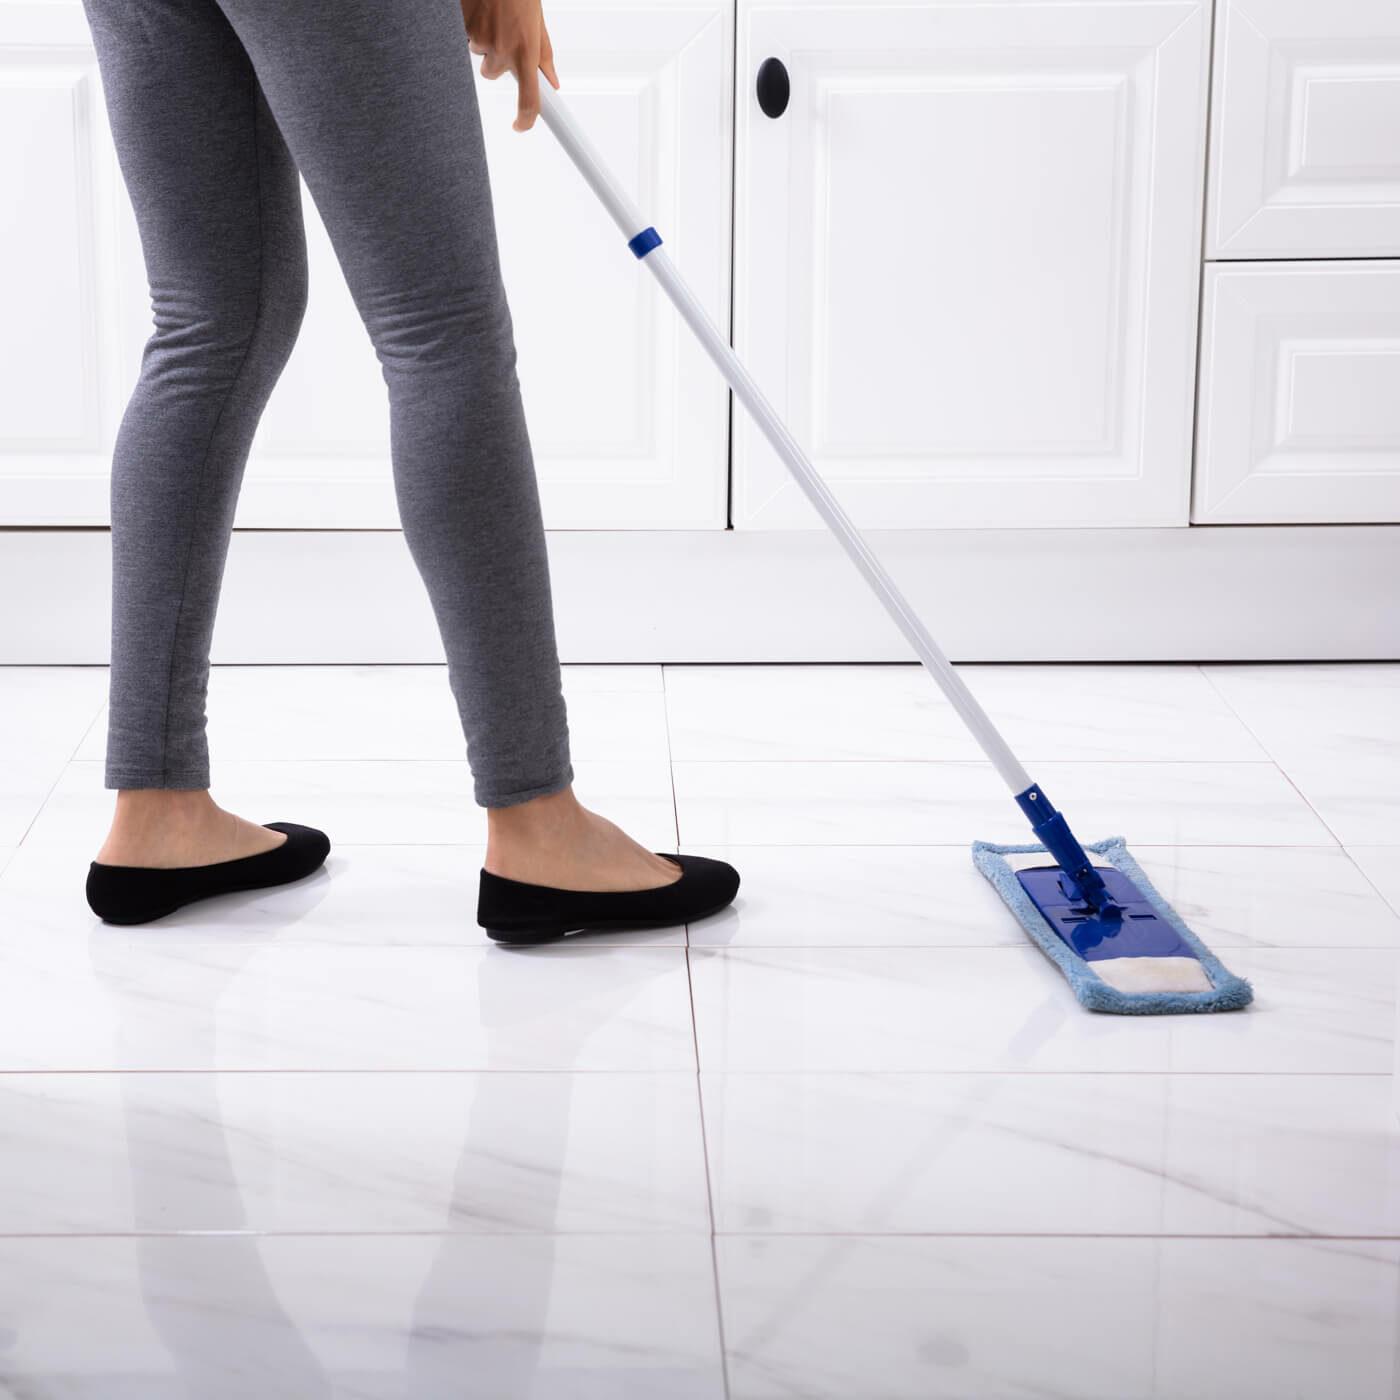 Sweep tile flooring | Warnike Carpet & Tile